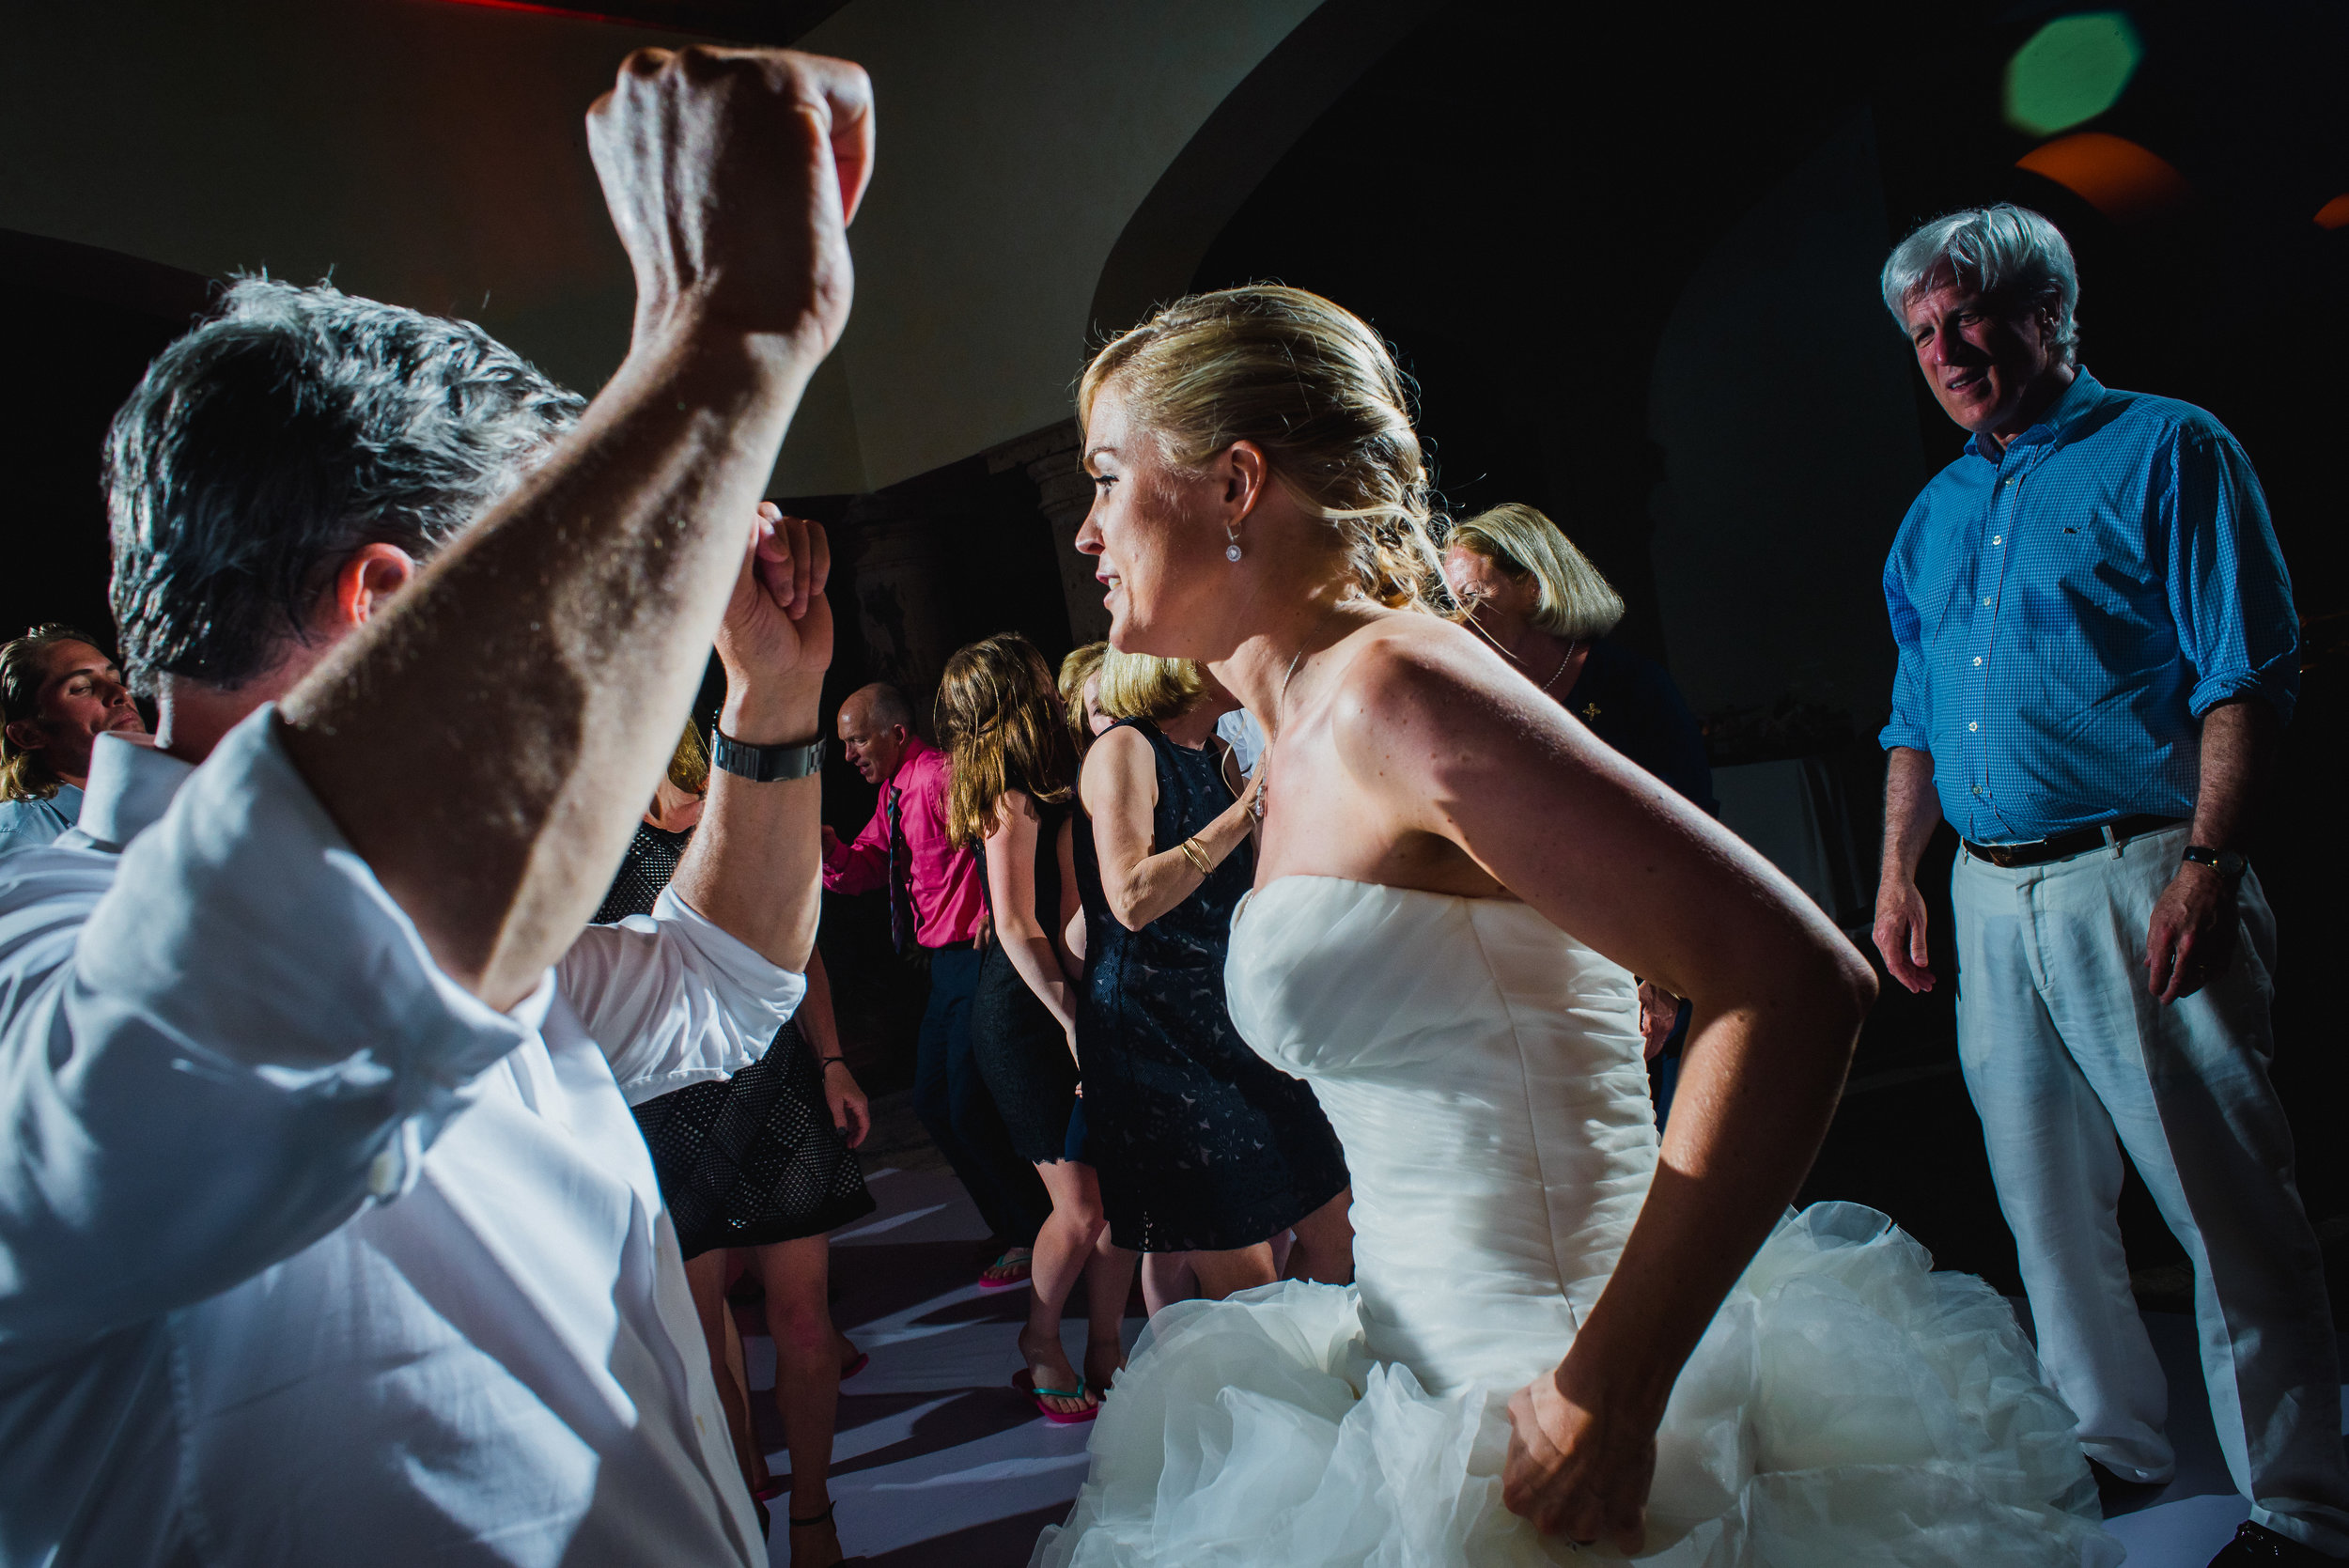 Cabo-destination-weddings-63.JPG